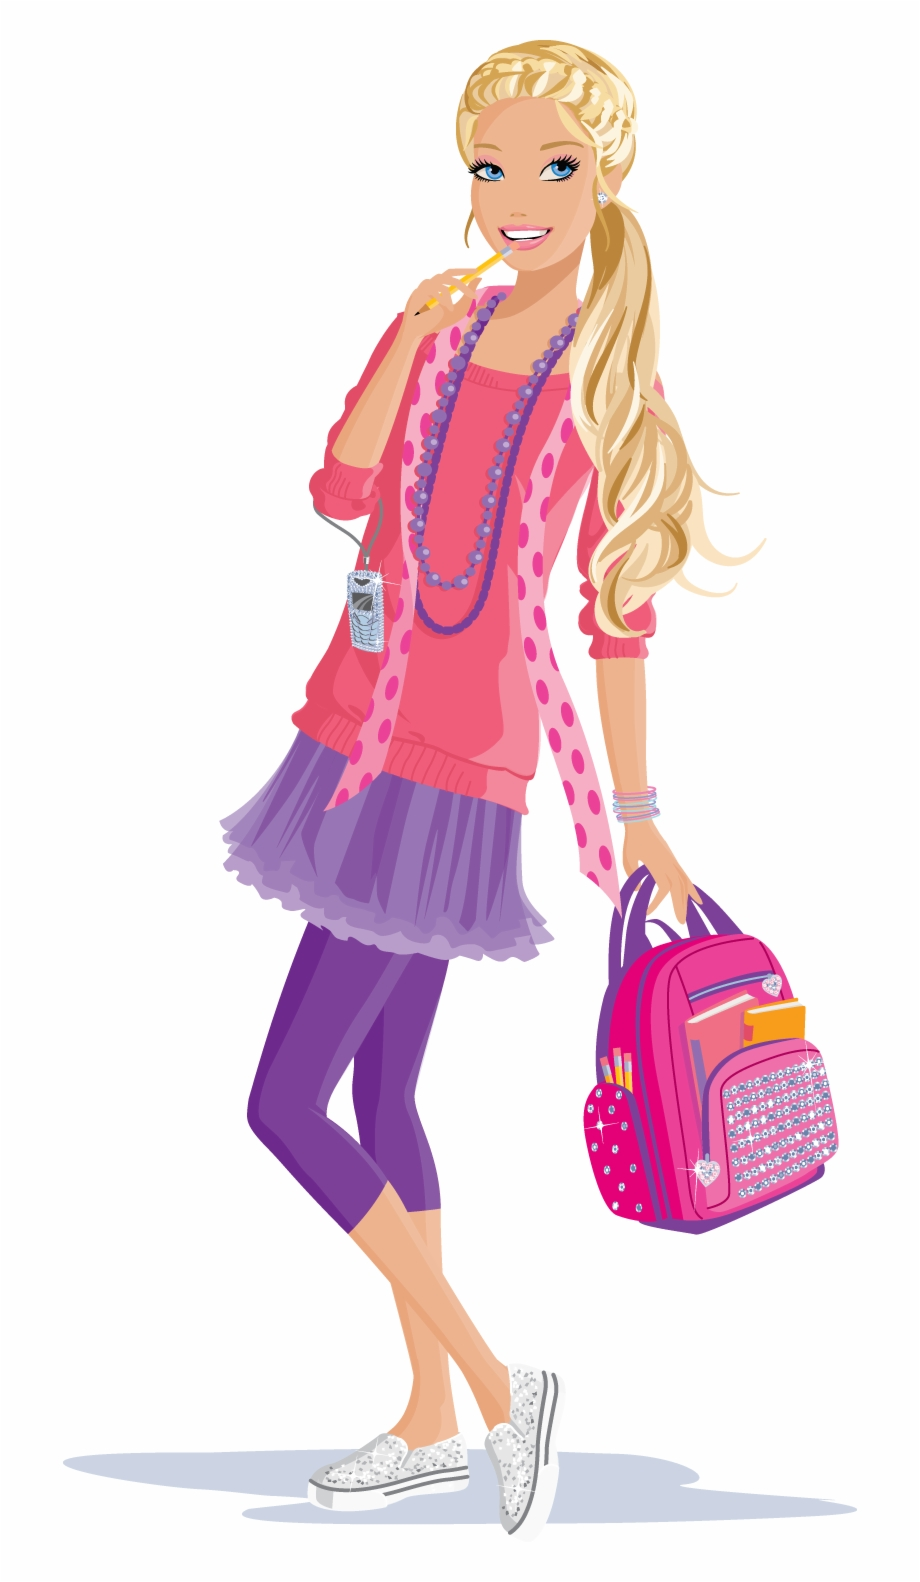 Barbie clipart school. Download transparent png clip